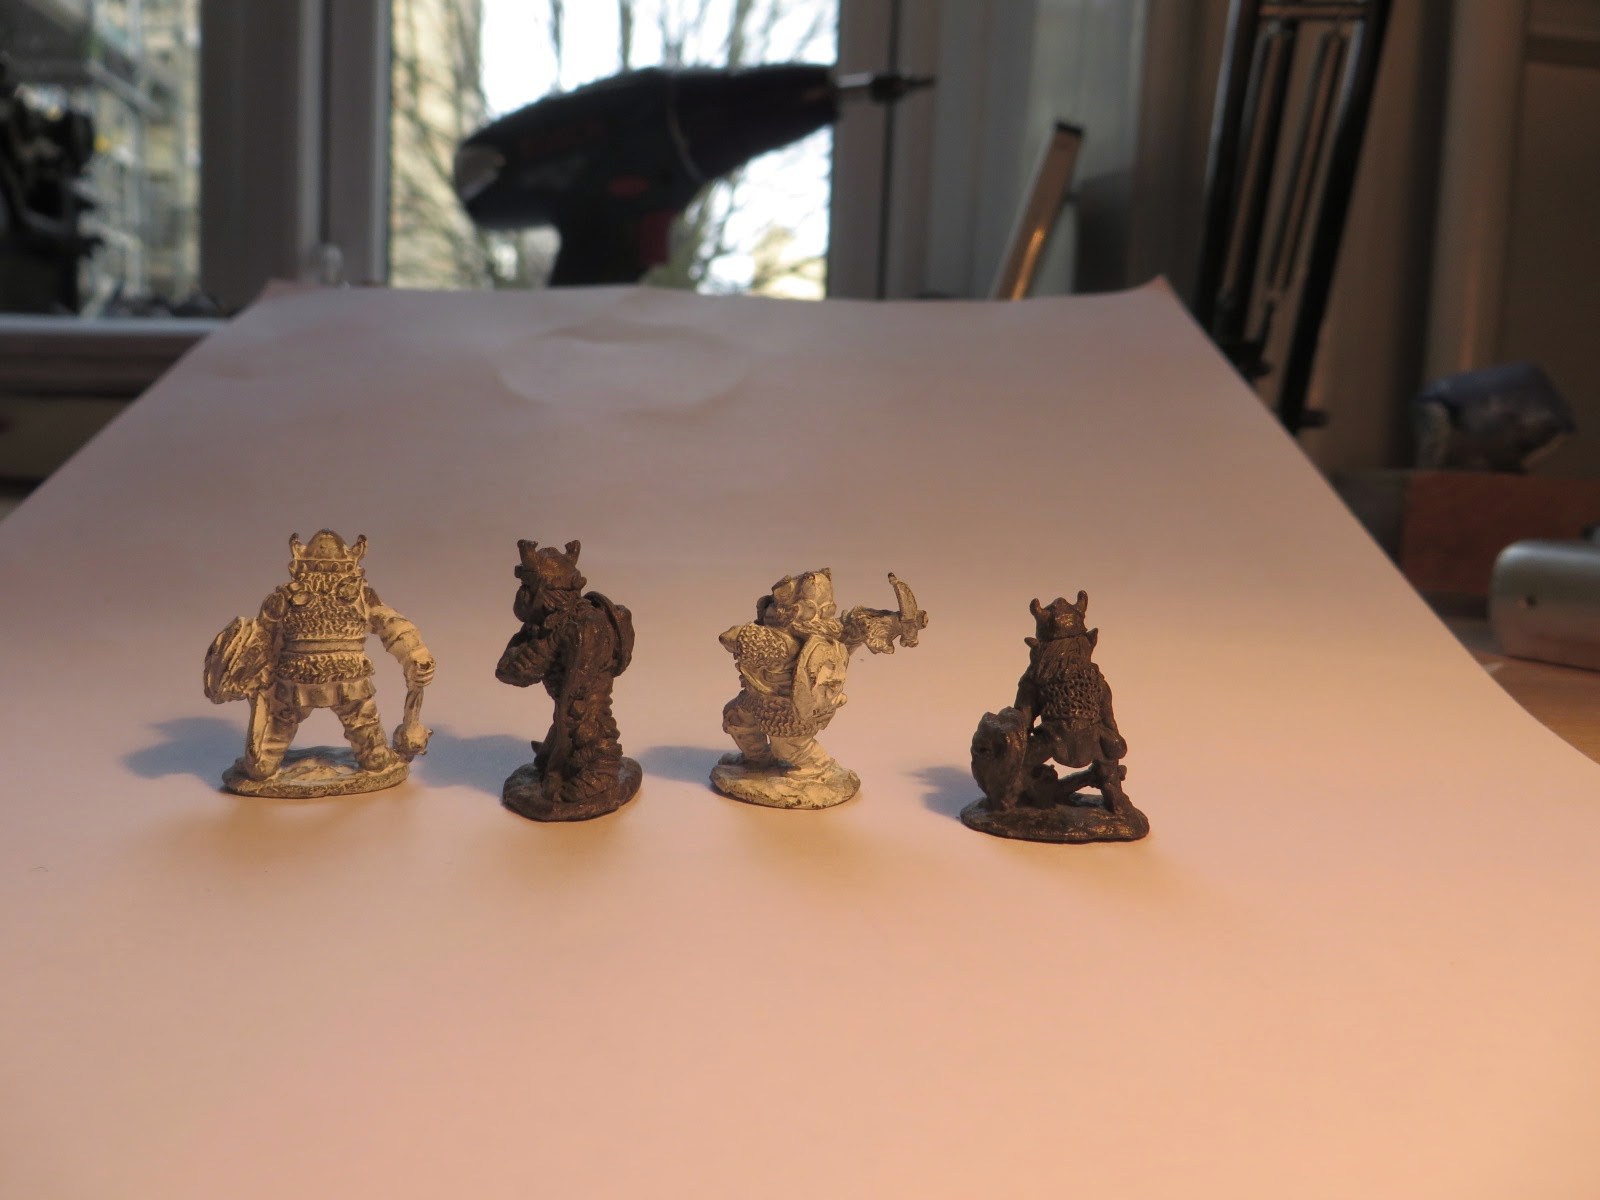 Speciality Set, 4, Goblin Raiding Party, Torg Dwarfsmasher, Snurd Hideflayer, Urag Legeater, Gigblad Childsplatter, citadel, oop